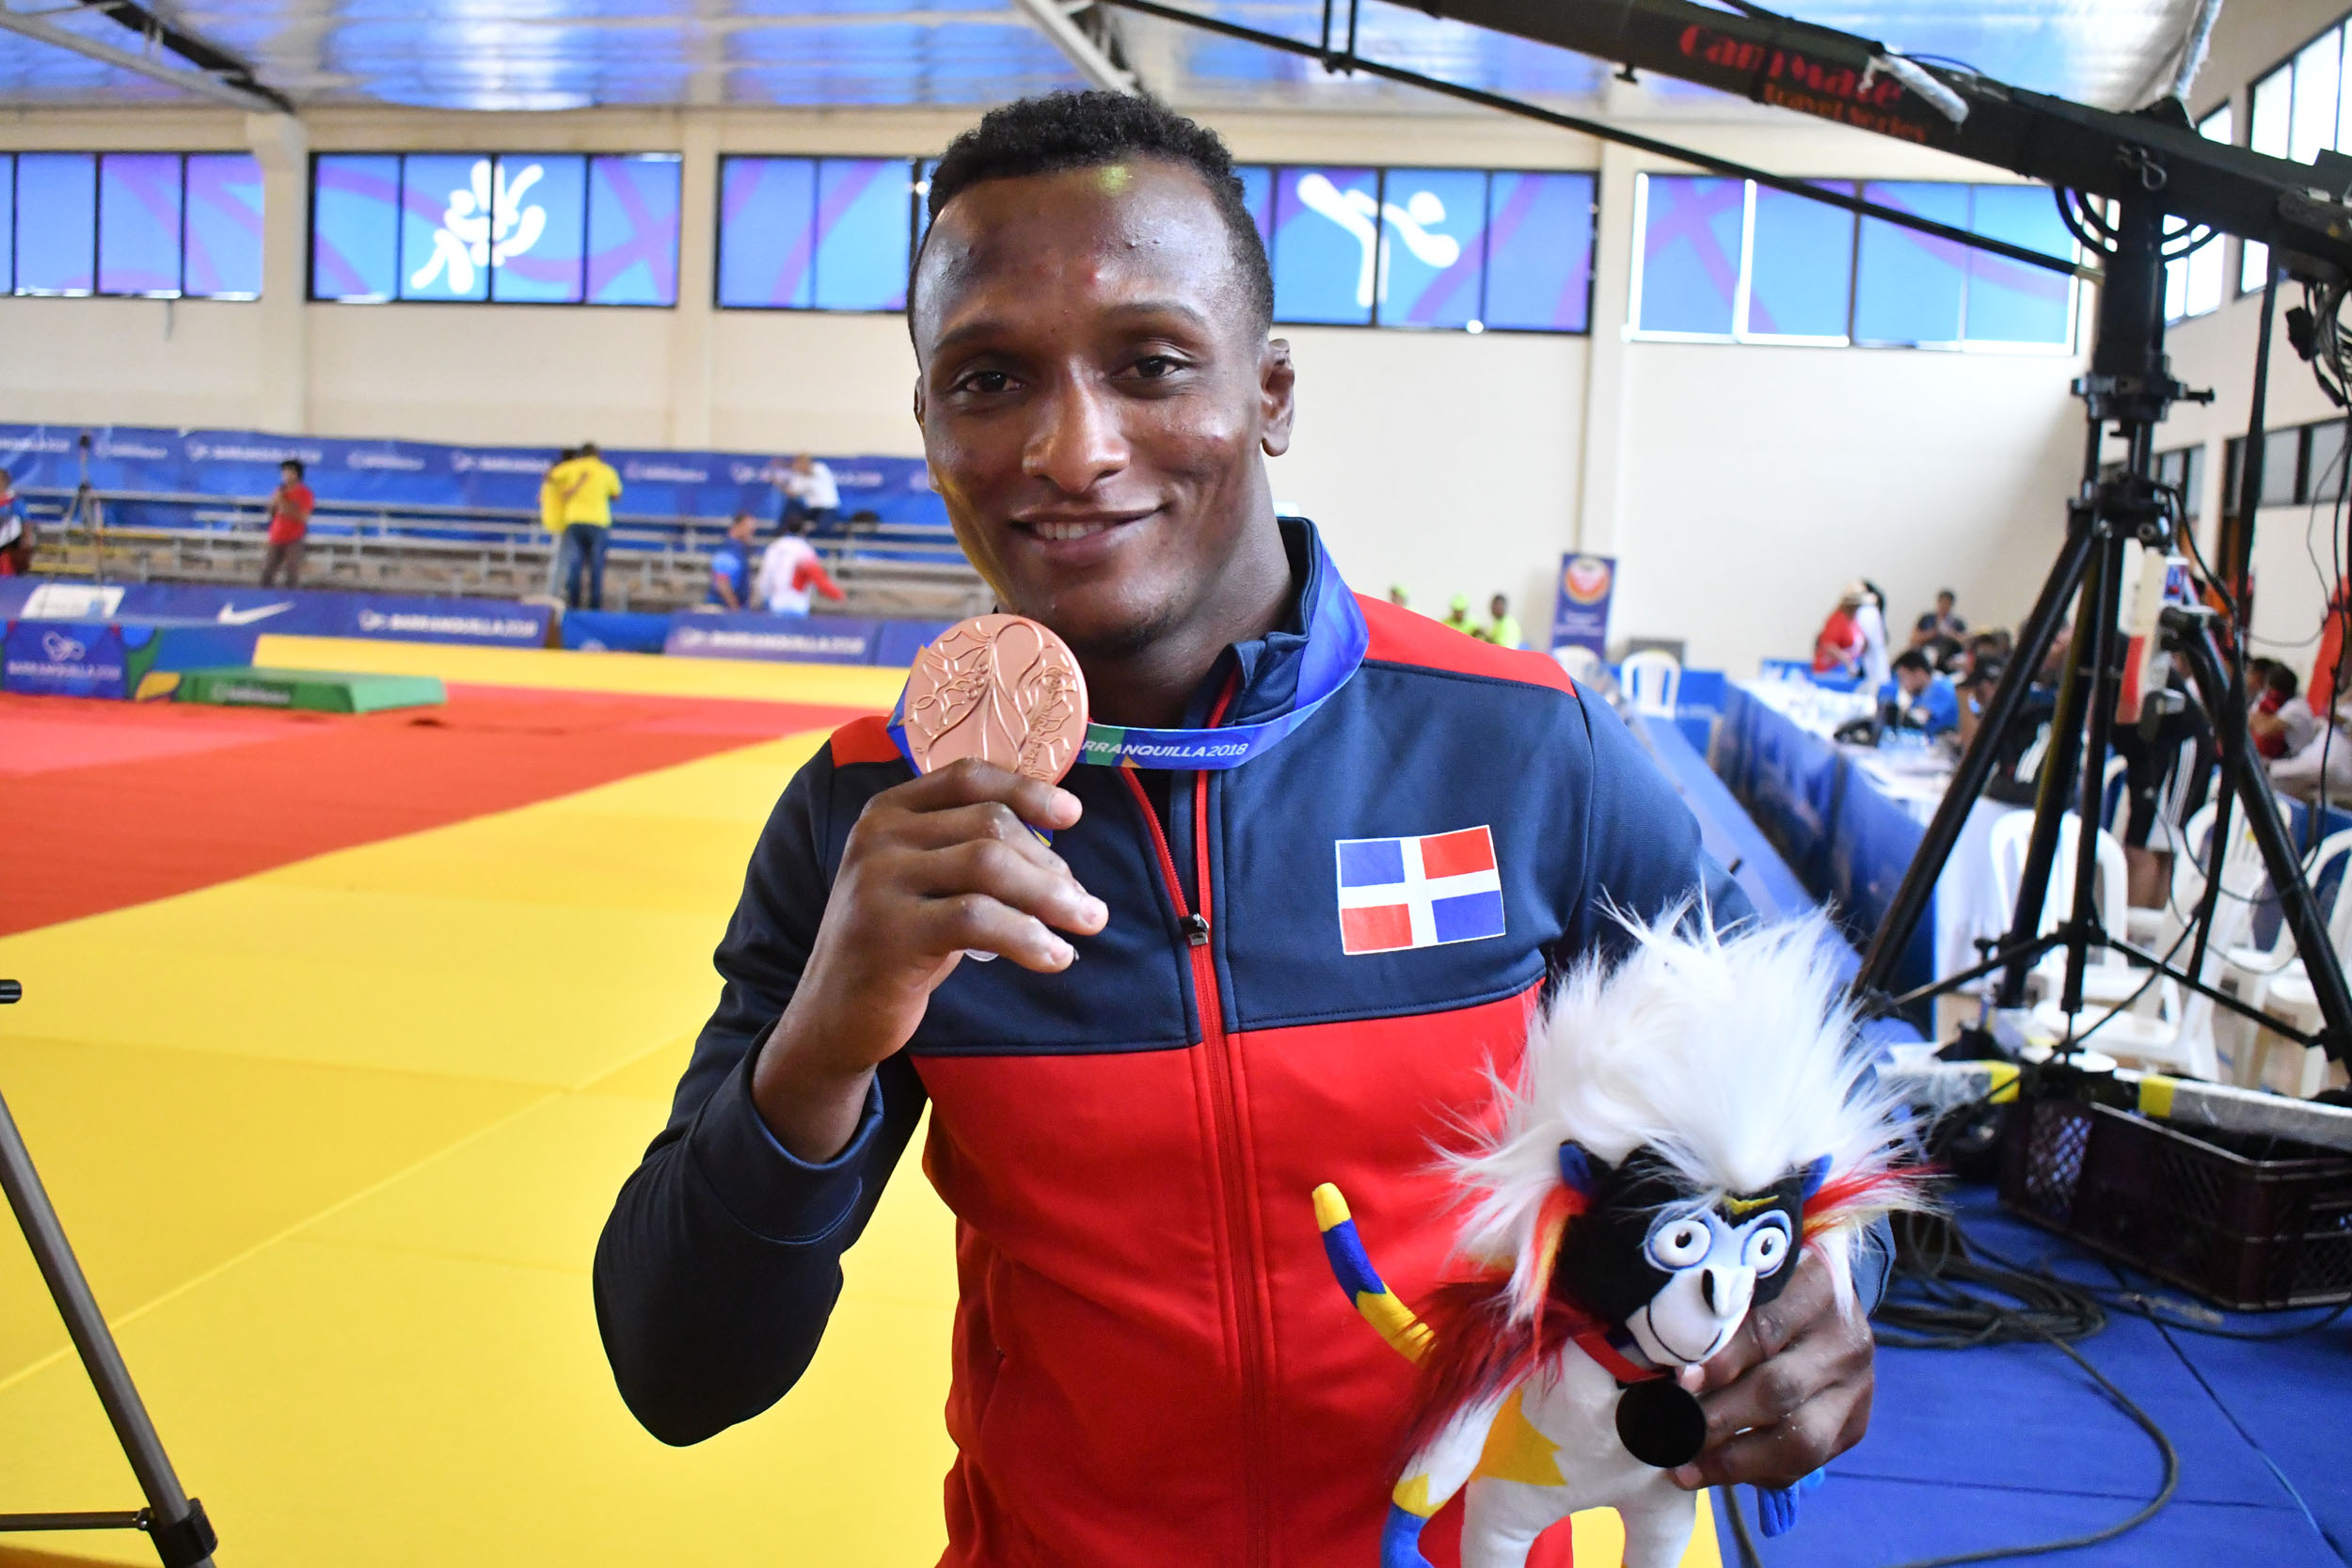 Judoca Wander Mateo revela que se retirará luego de Olimpiadas